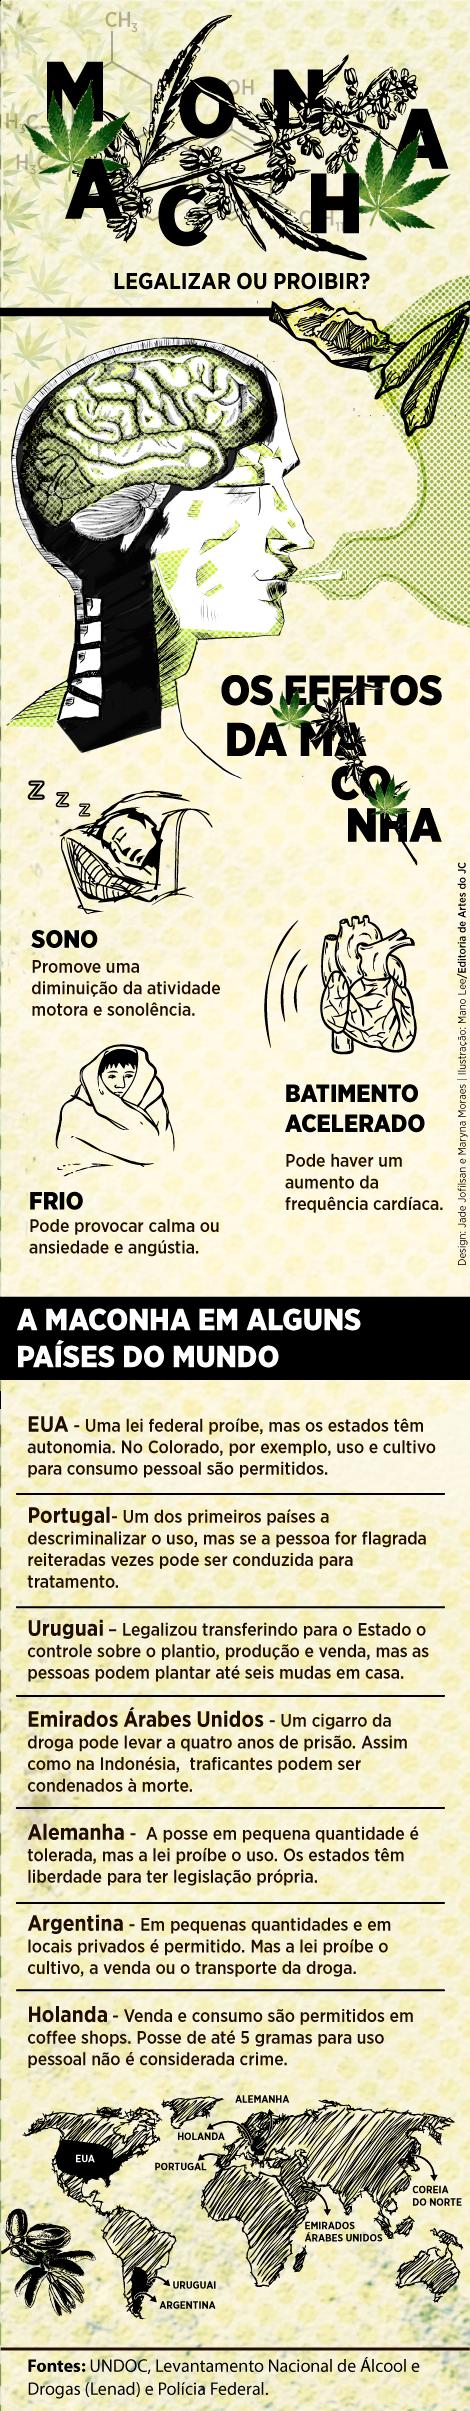 infograficoweb_maconha1